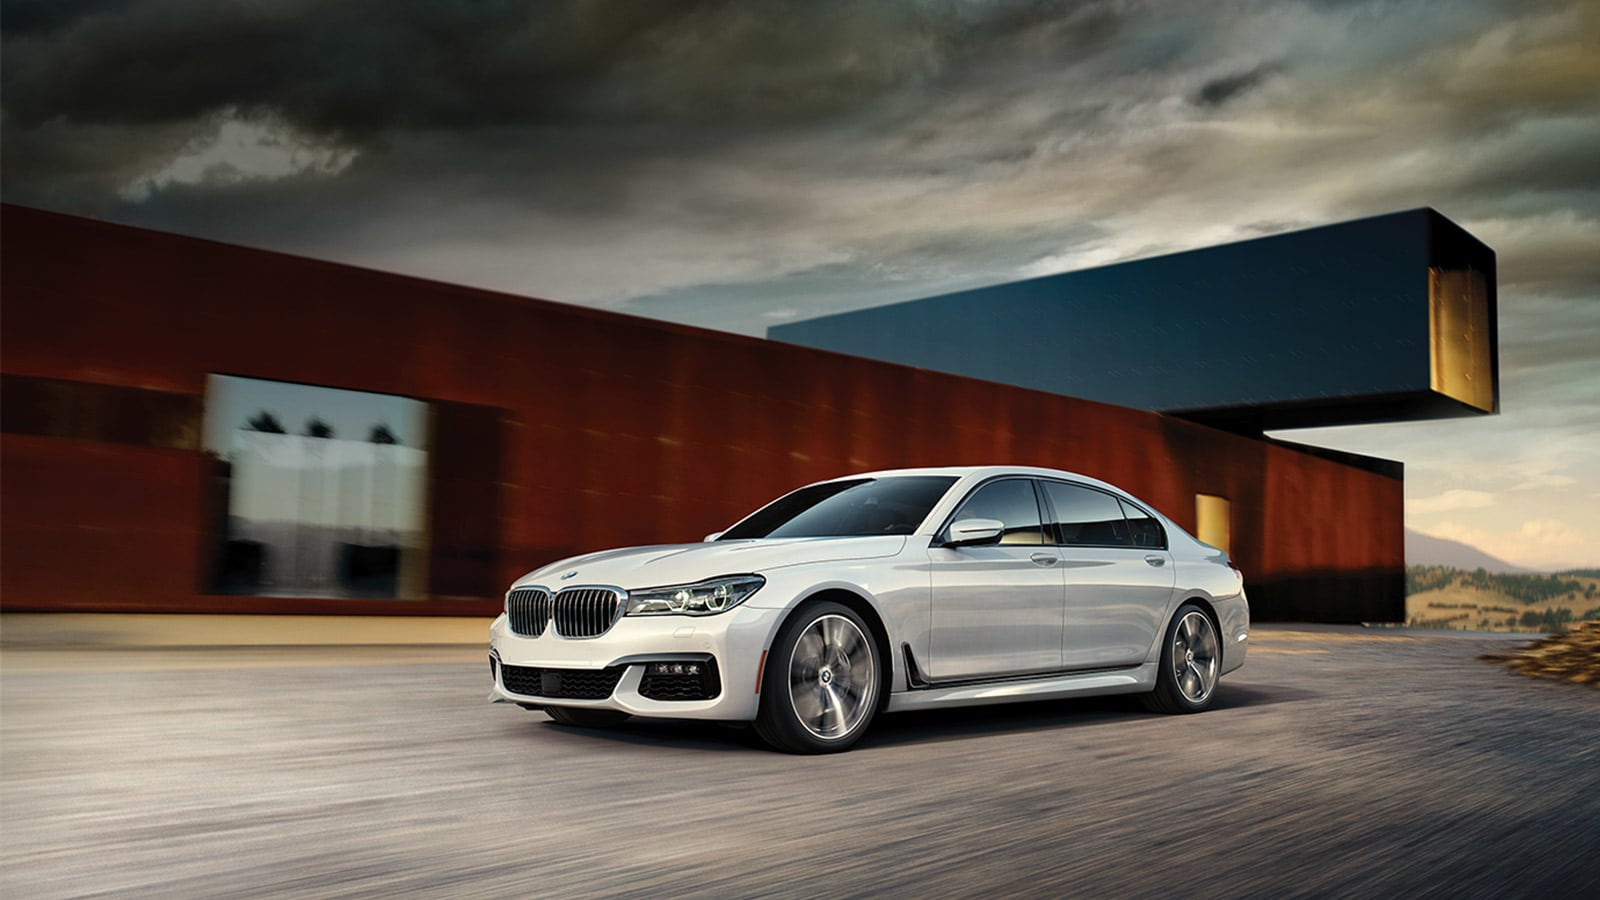 Bmw Dealership Near Me >> 2019 BMW 7 Series for sale near Oxford, MS - Herrin-Gear BMW